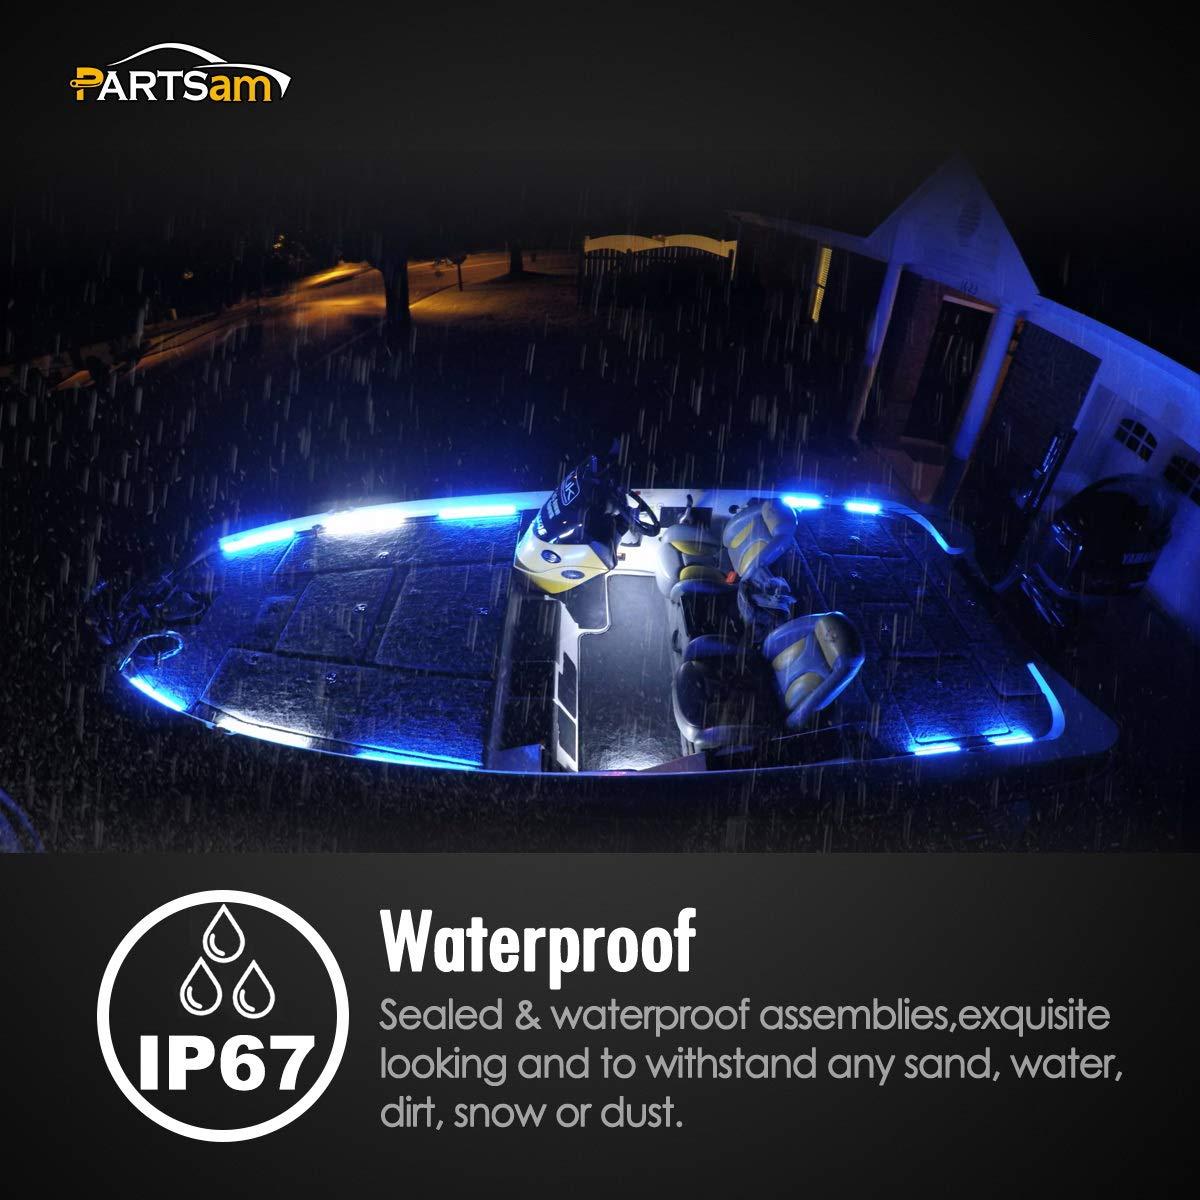 Partsam 10 Sealed Underwater Led Light Strips Bar for Boats RVs Caravans Horsebox Utility Vehicles 6 Waterproof LED Light Bar 12LED Utility strip Bar Boat Lights Clear//Blue